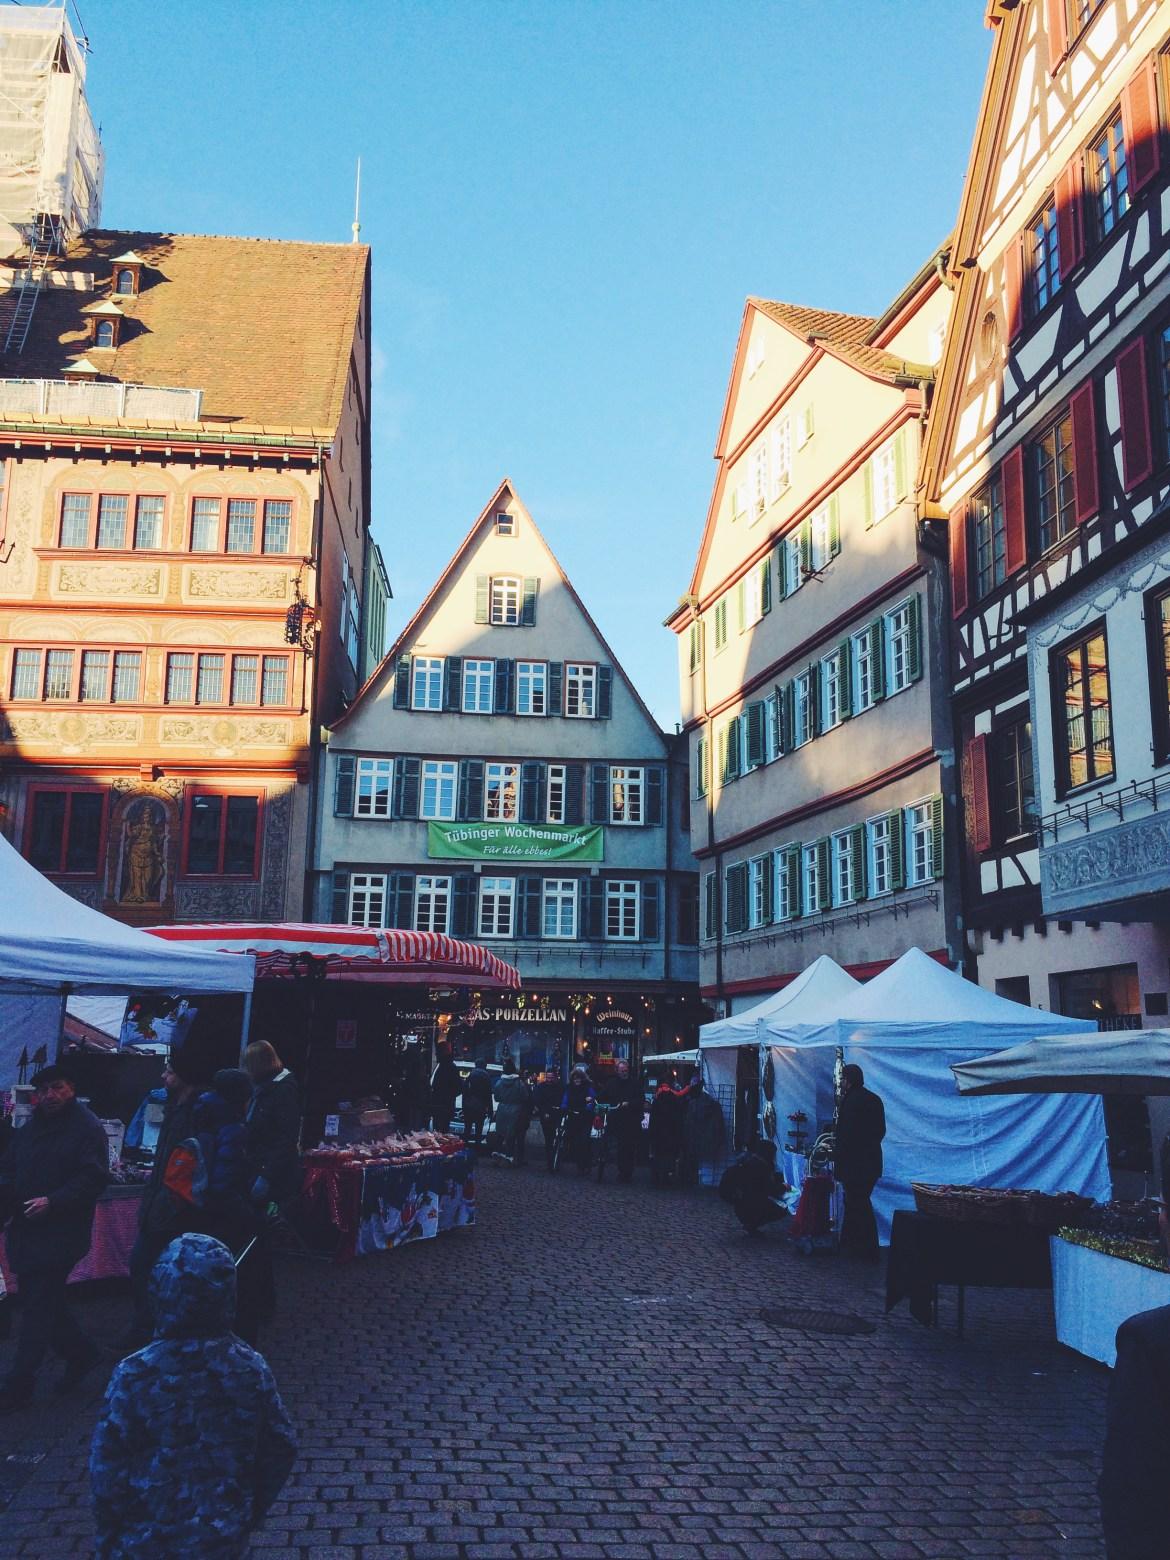 Christmas Markets in Germany, Tubingen